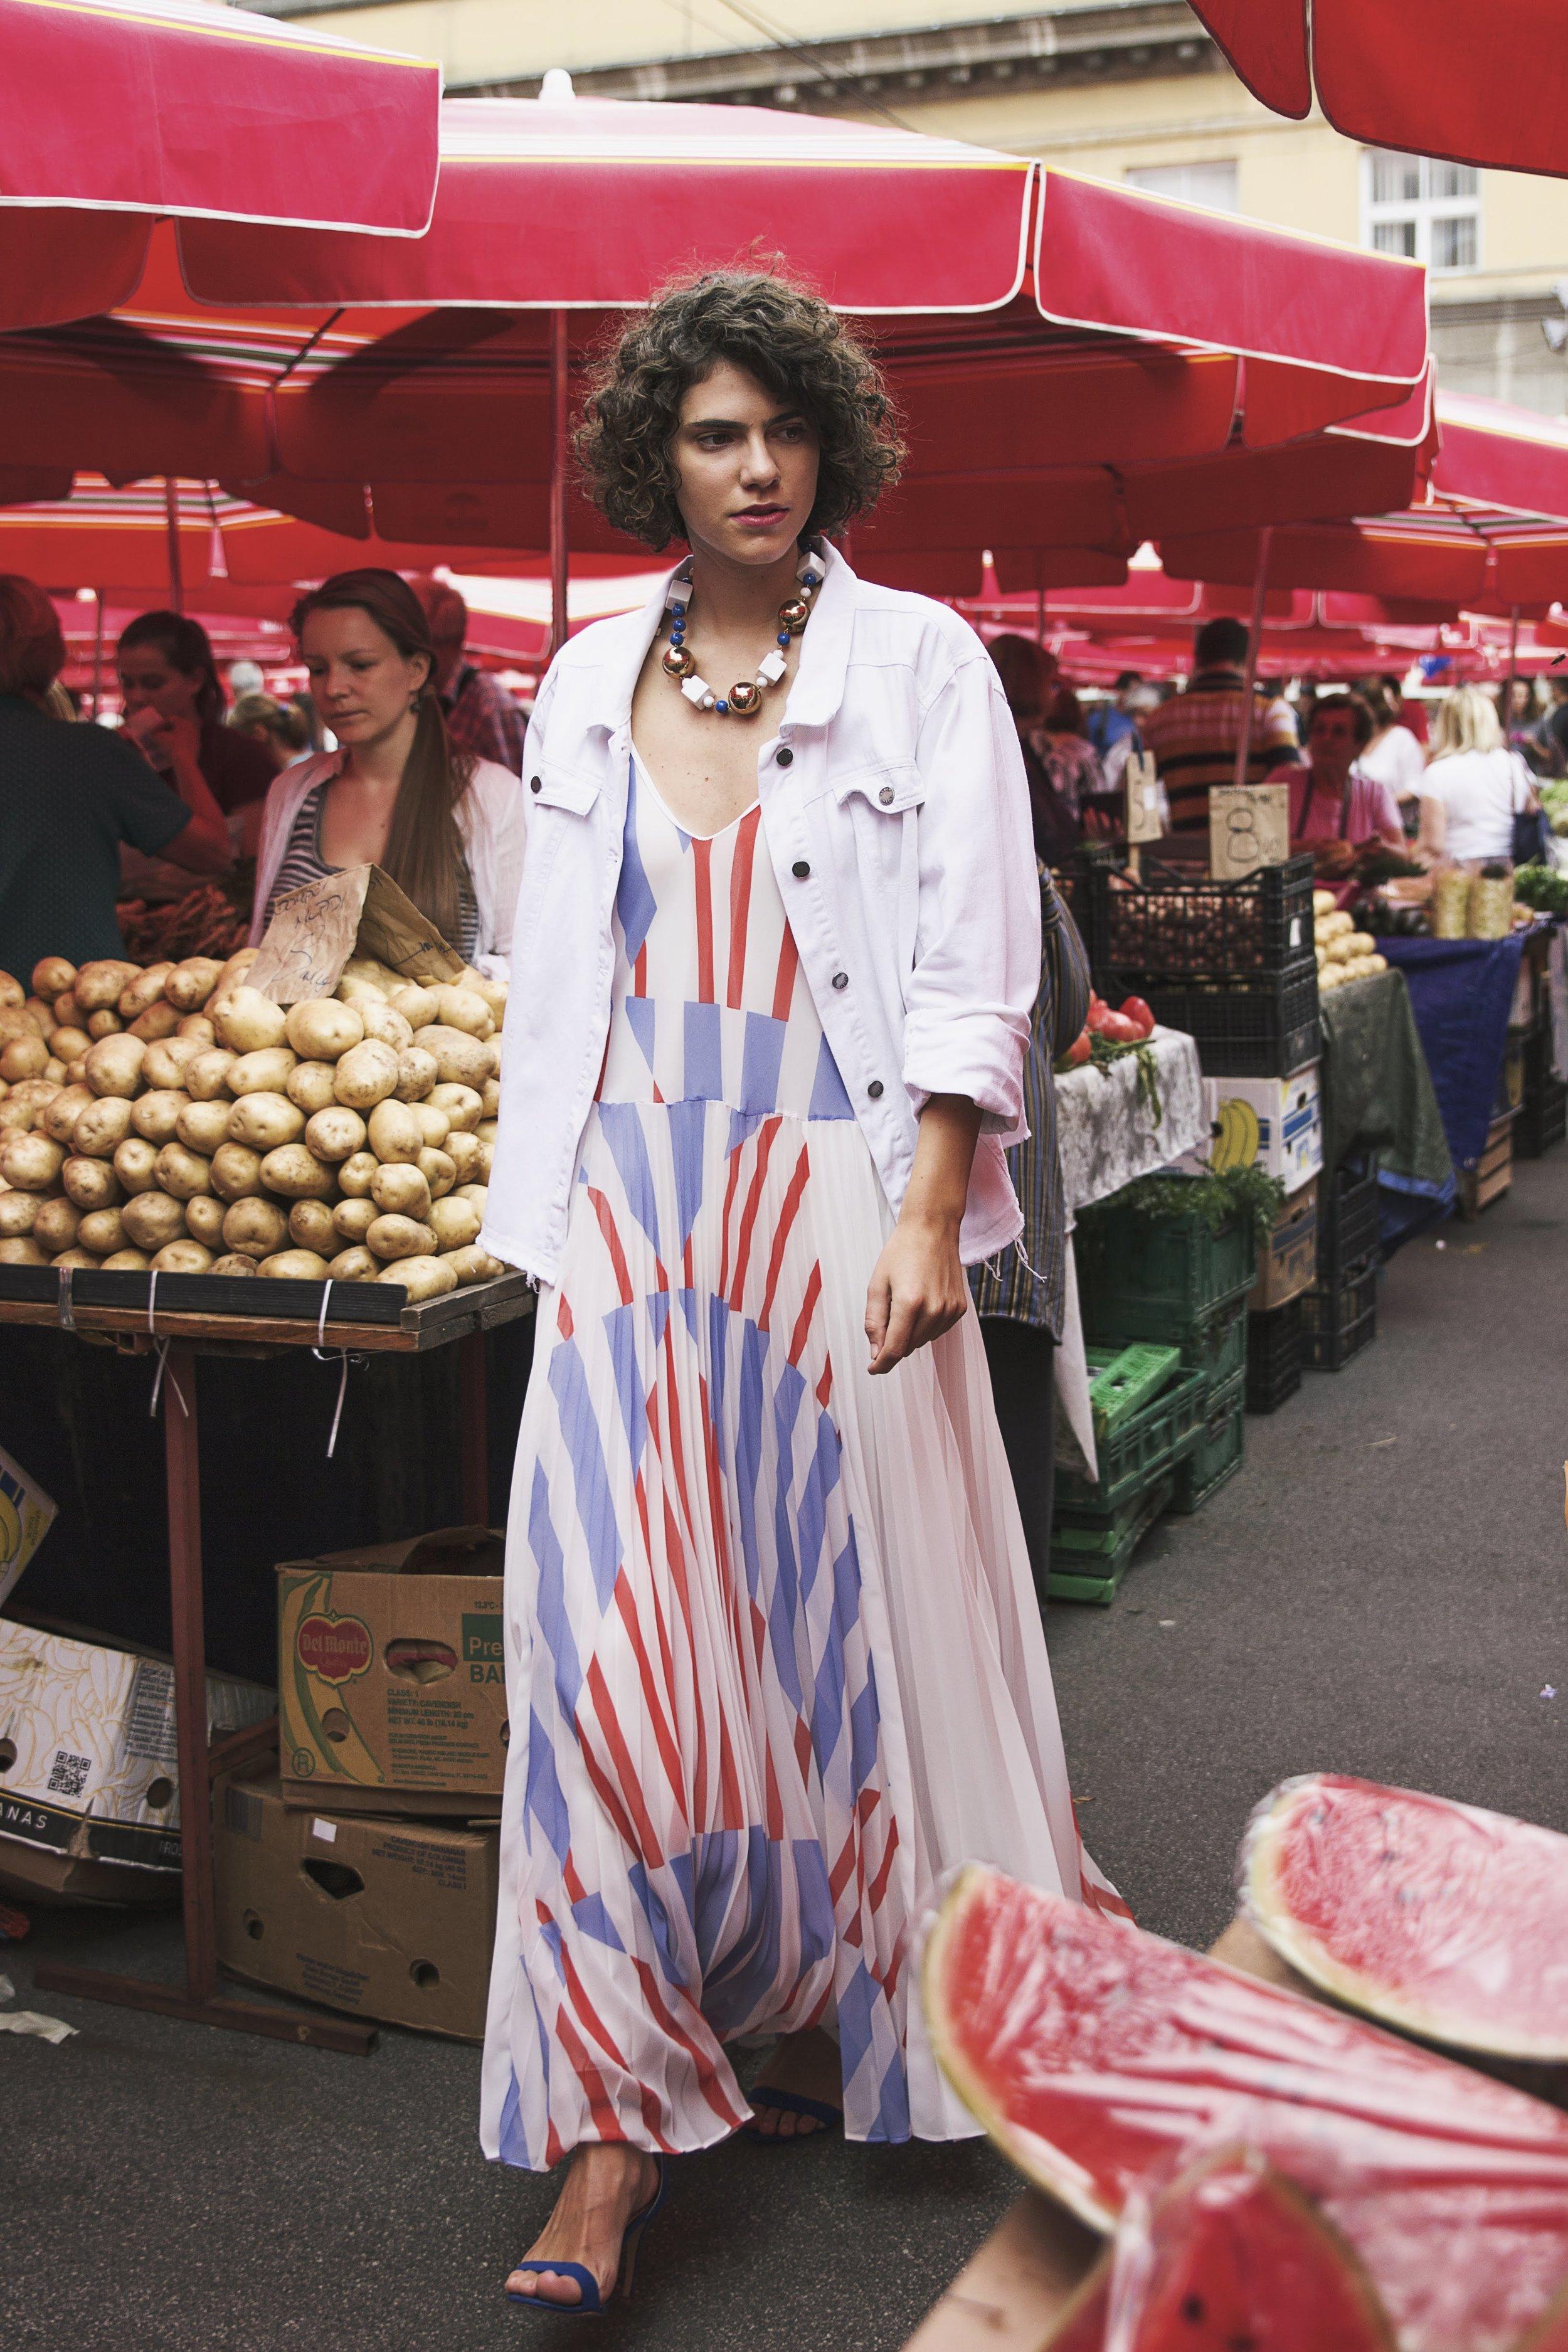 luka-lajic-fashion-photography-robert-sever-dizajner-croatian (15).jpg